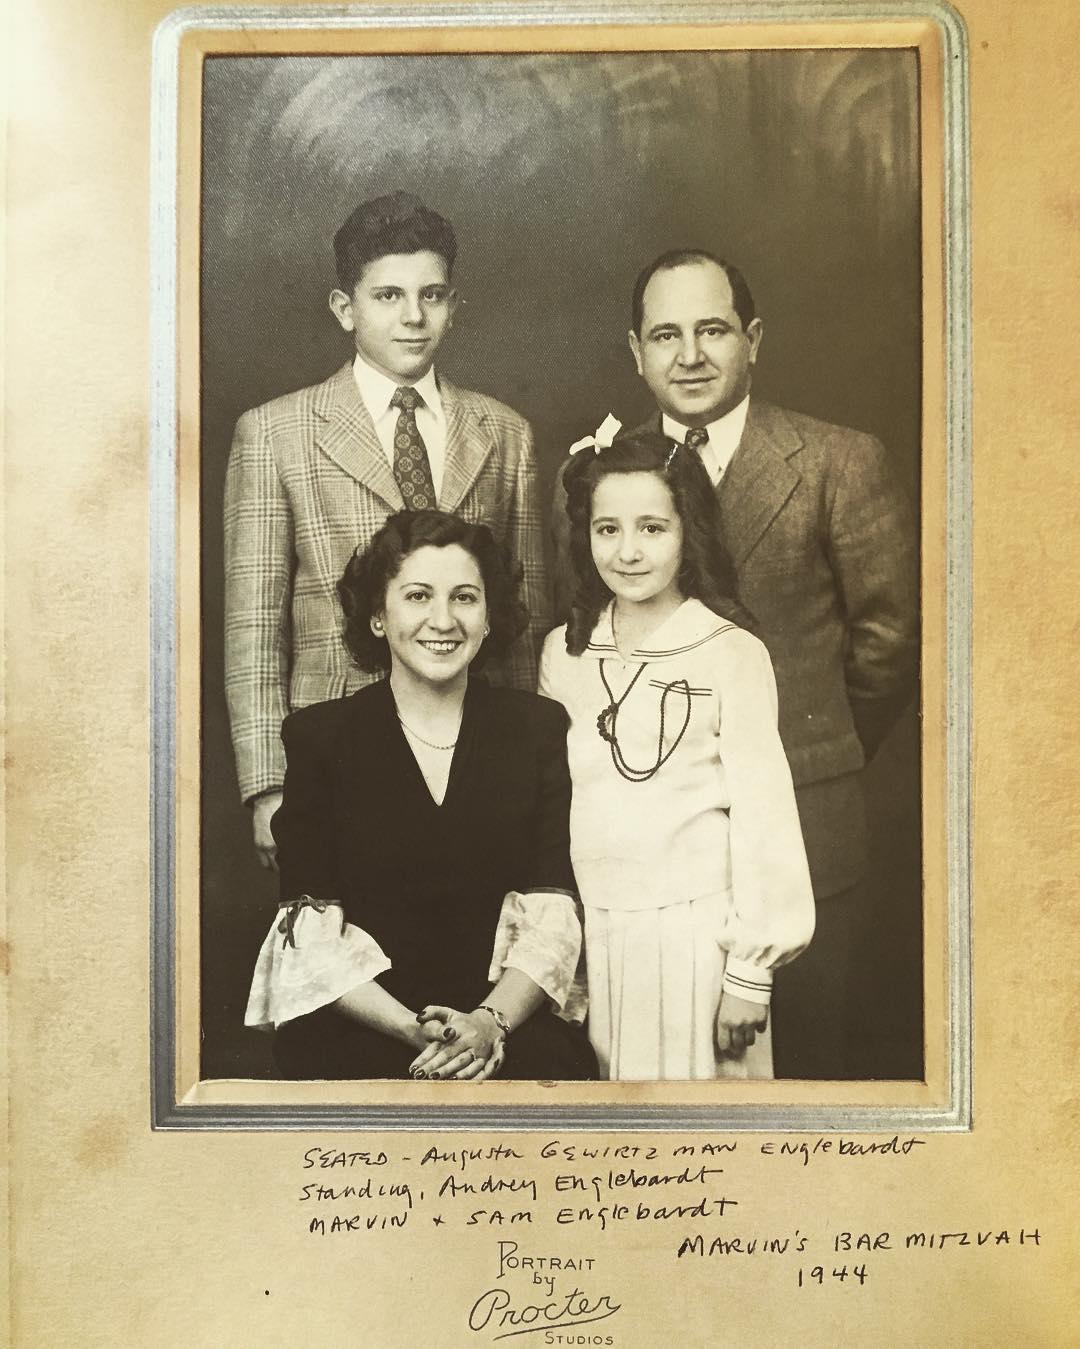 """Studies in #Jewish #hair, mid 1940s edition, subset #barmitzvah pics"" #eastcoastjews #tbt #family #namesake #grandpa Sam #grandma Gus, #nunni #marvinsbarmitzvah #portraitbyproctor"